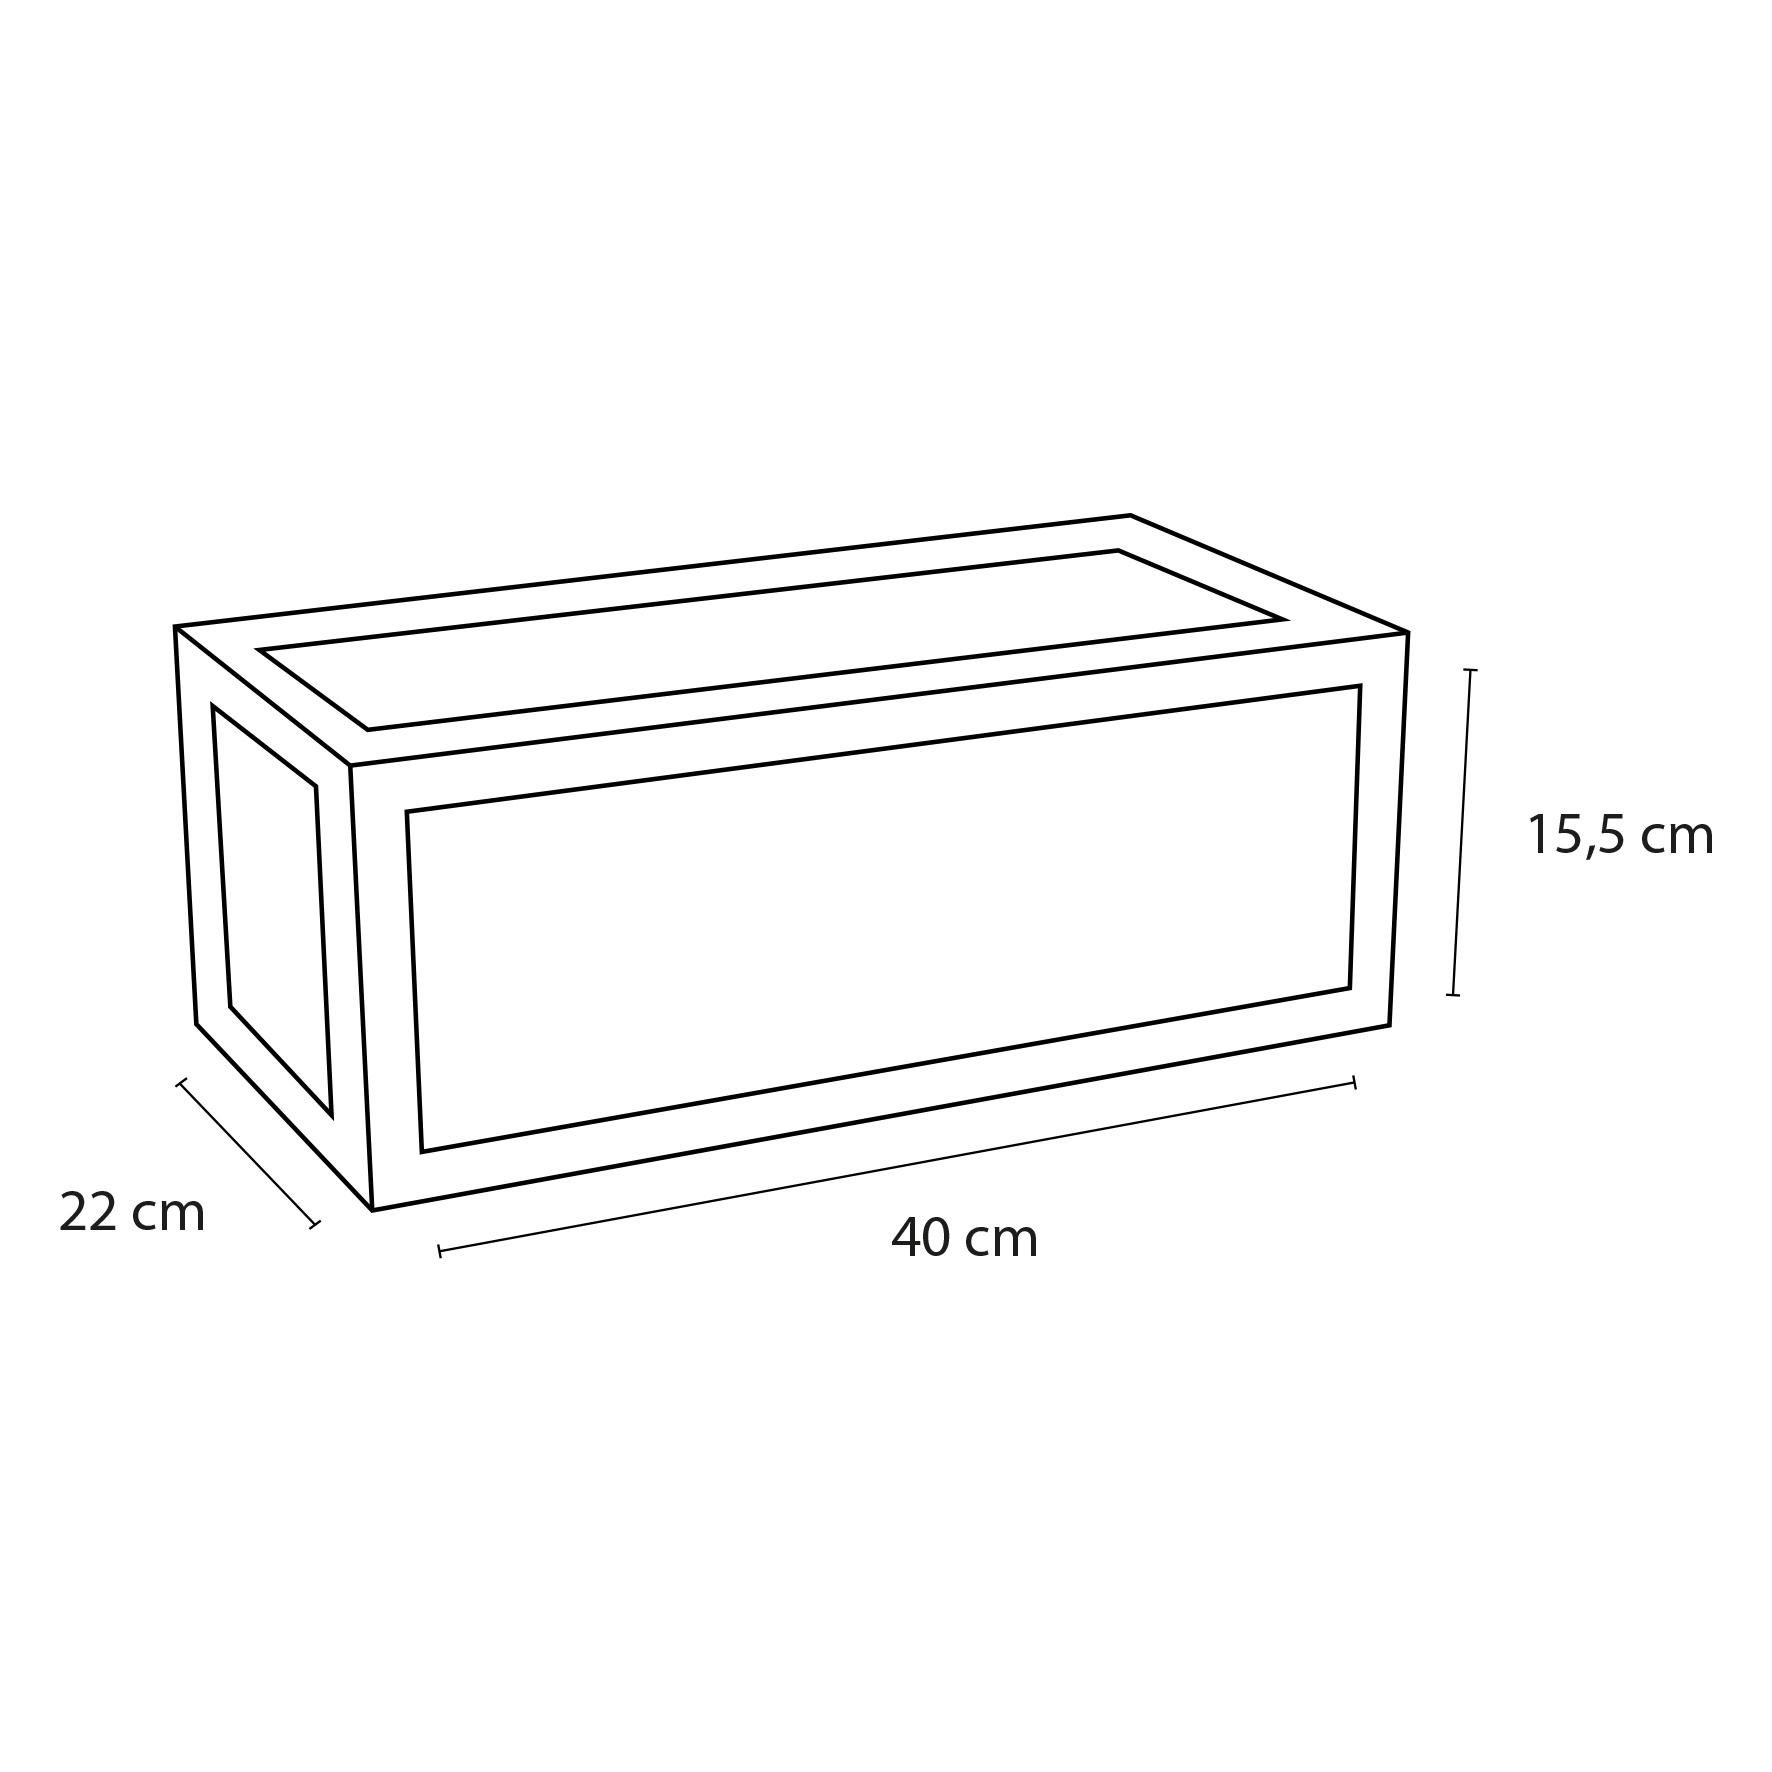 Handdoekrek Fontein 40x20 cm Zwart-4